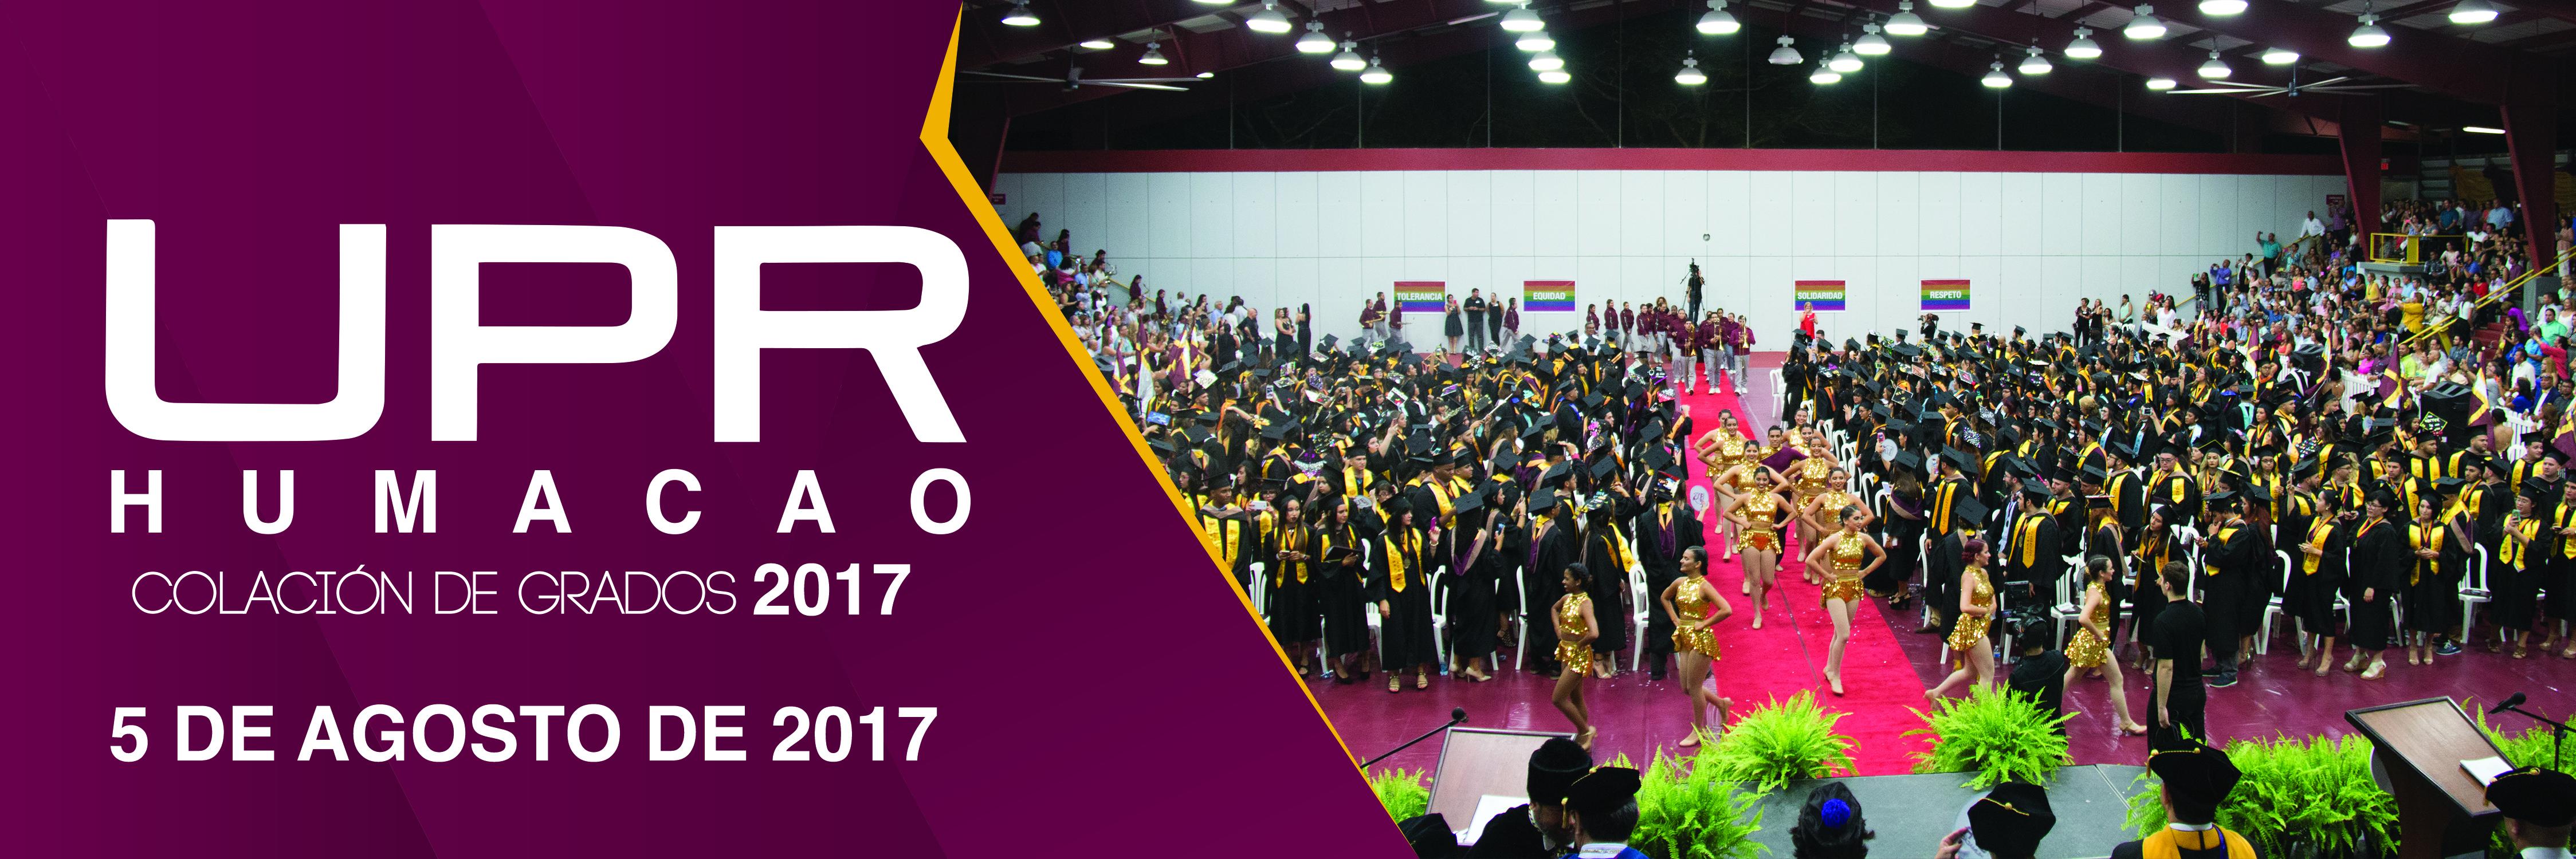 Banner de Colación de Grados 2017